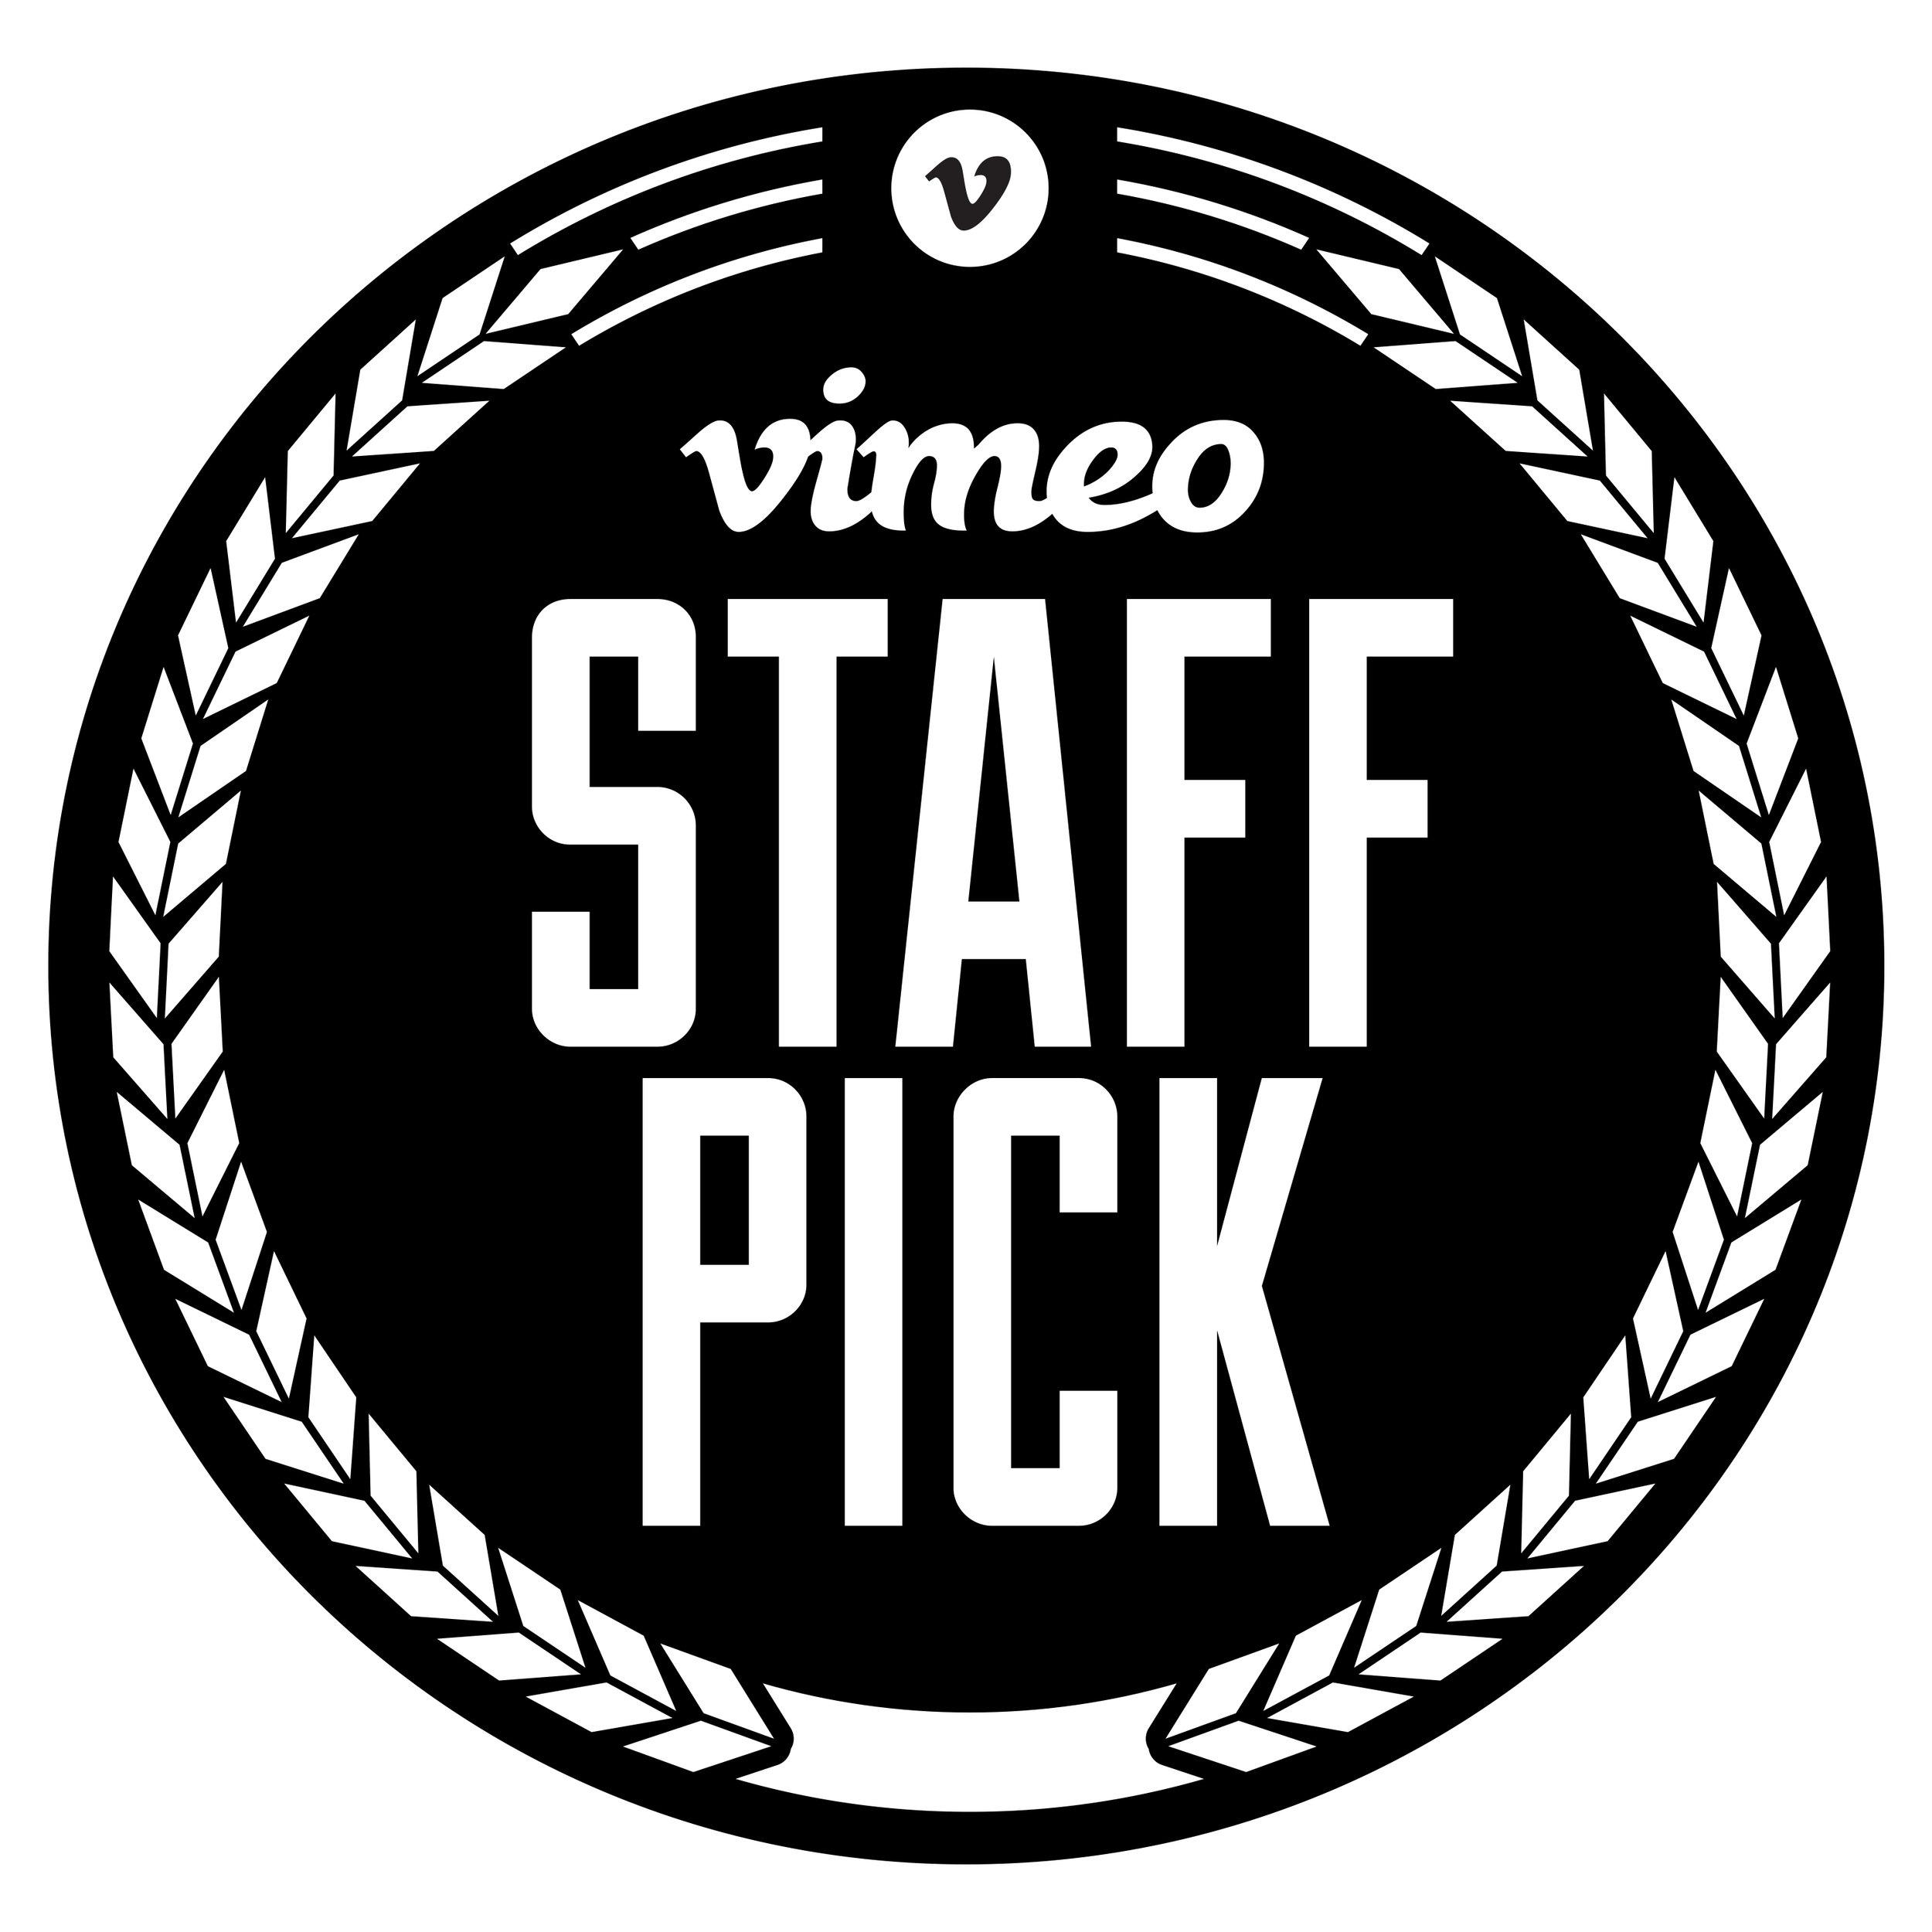 staff-picks-logo.jpg